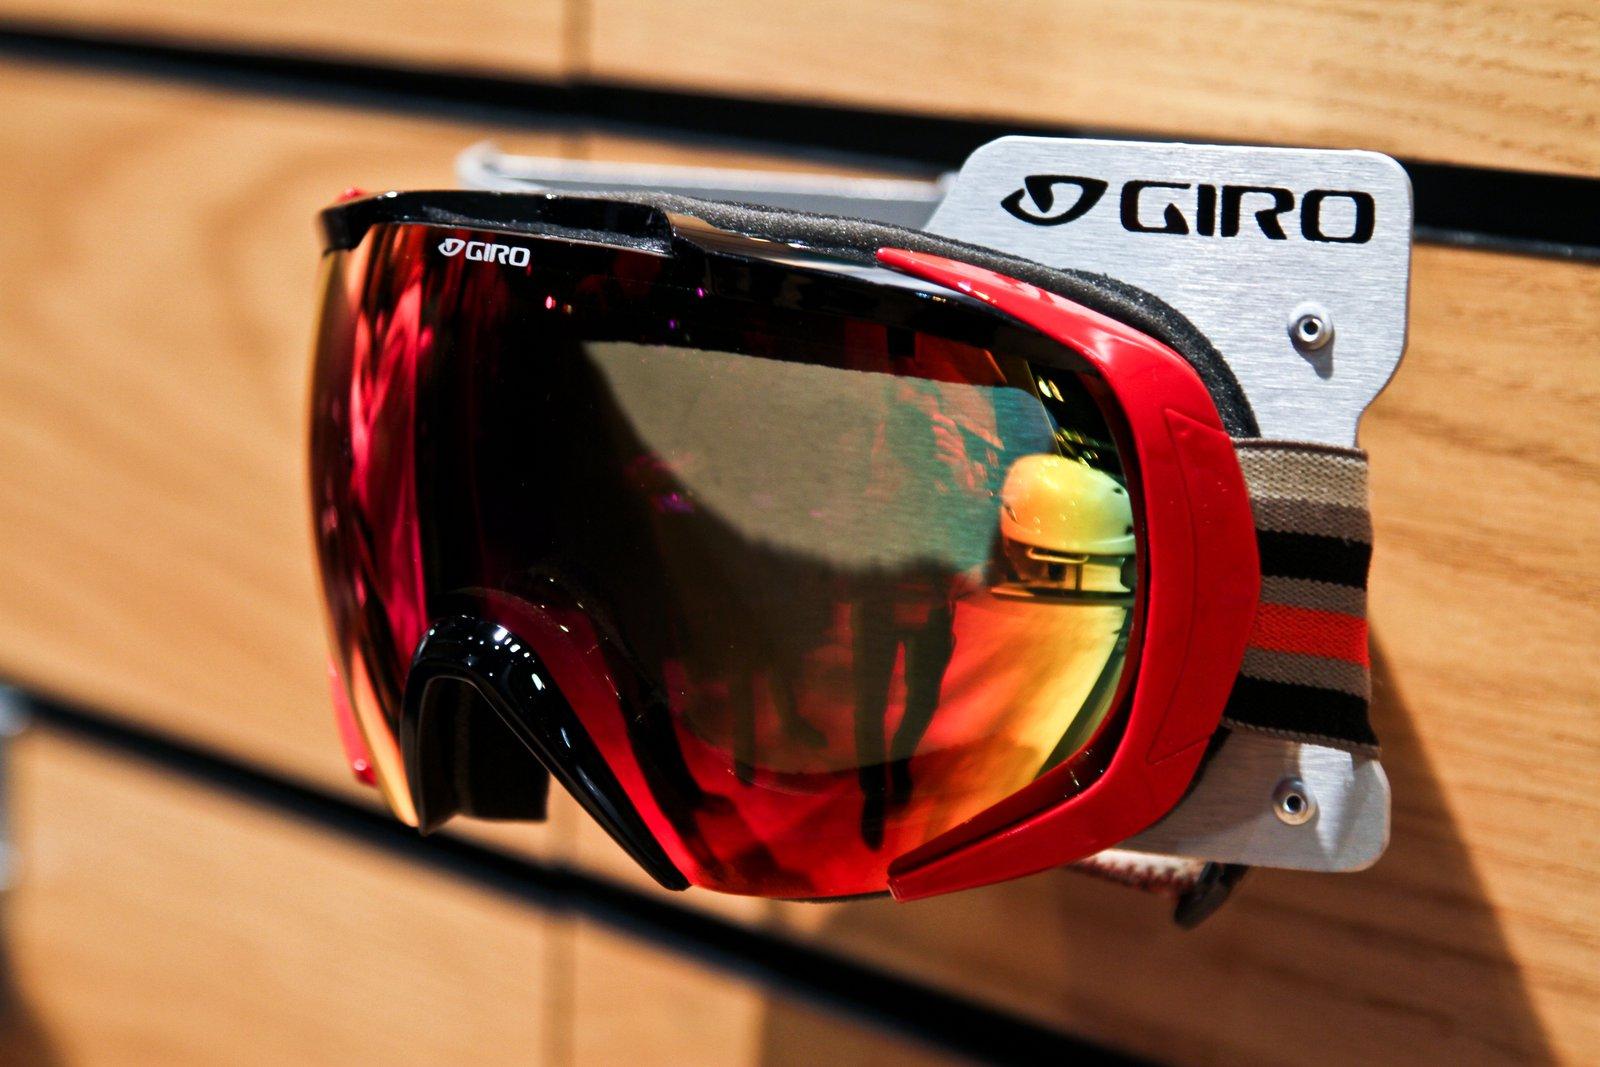 Giro-8.jpg